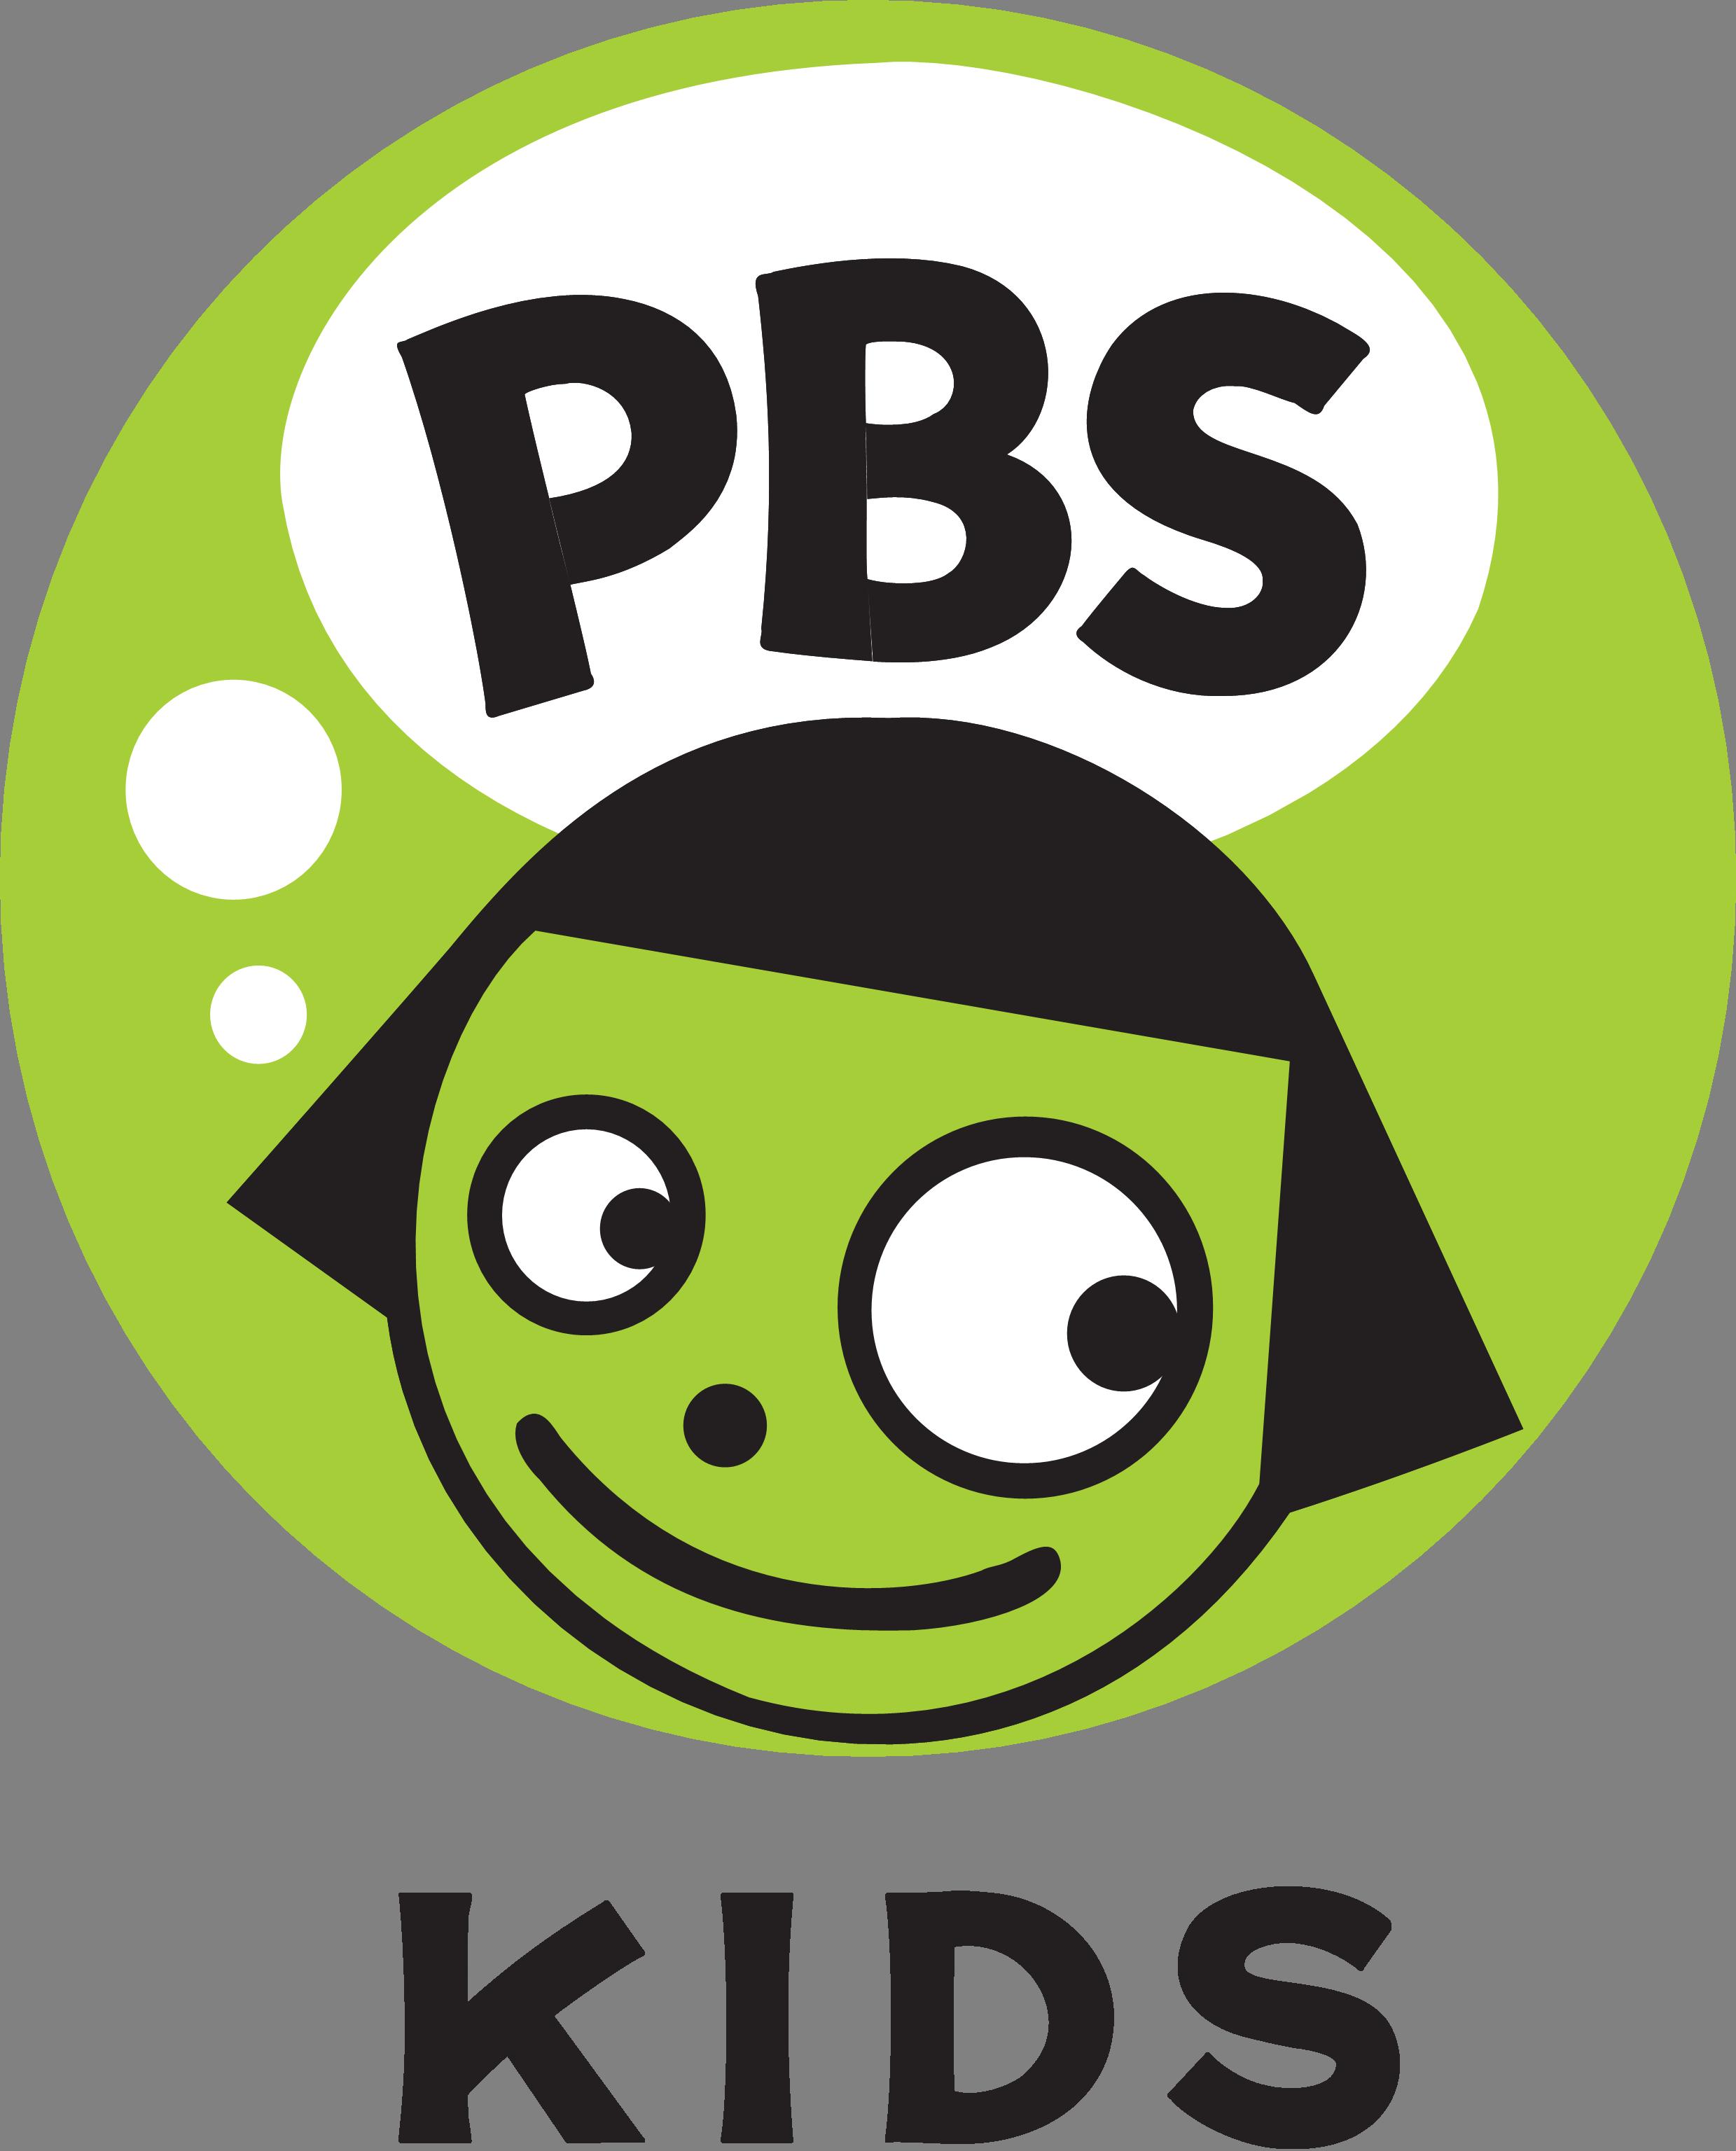 Pbs Kids Logo Dash And Dot Images Pictures Pbs Kids Dot Pbs Kids Kids App